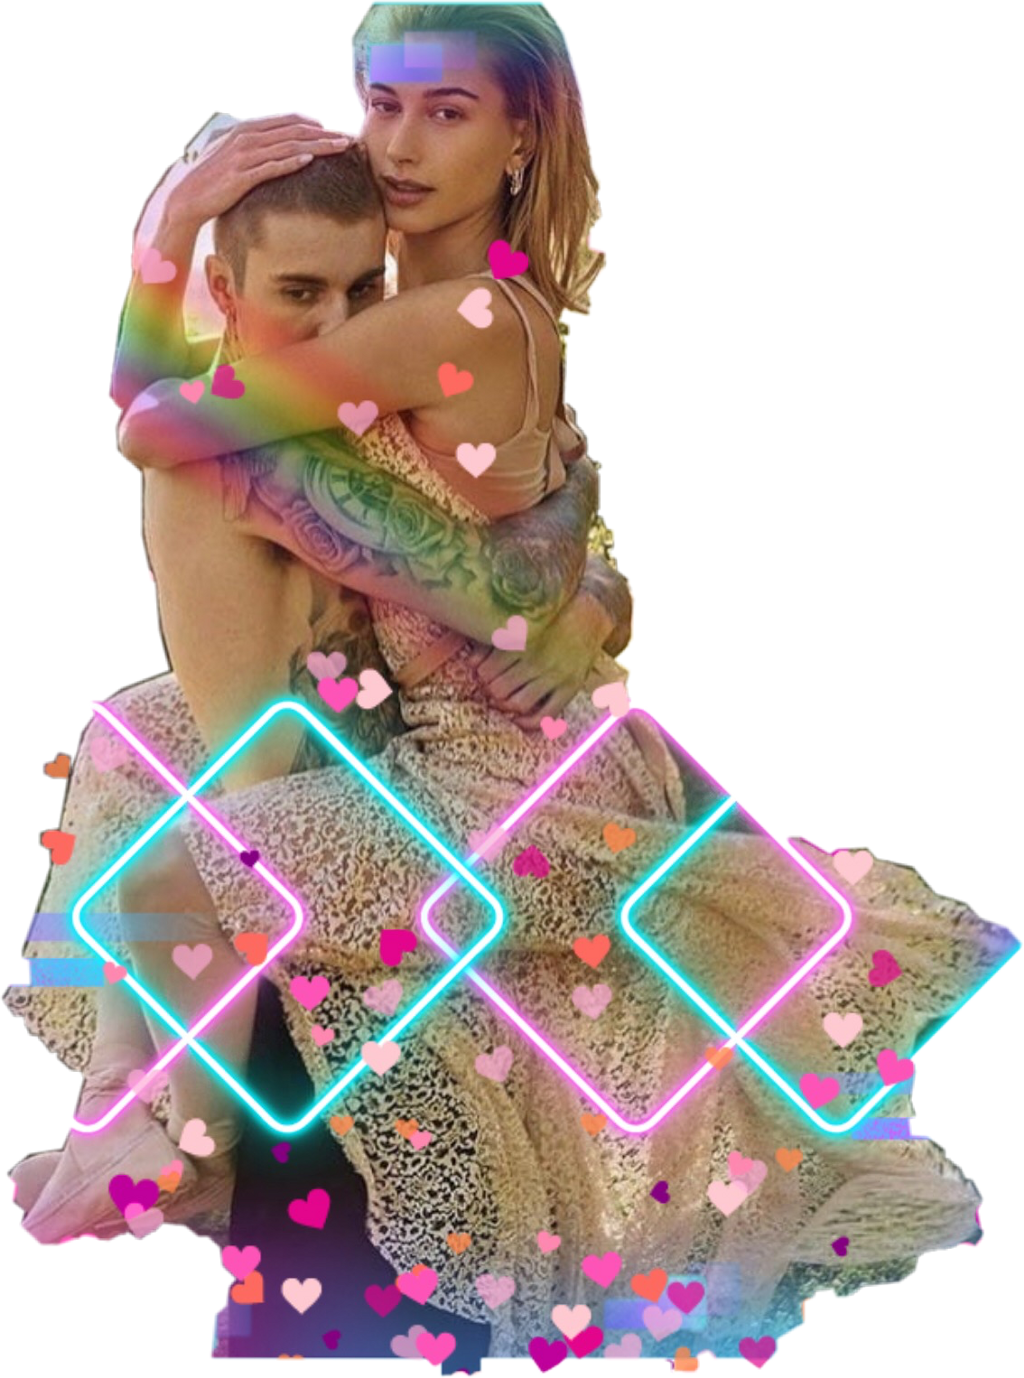 #freetoedit #justinbieber #justin #jb #bieber #justinbieberedits #believer #drew #justindrewbieber #haileybaldwin #hailey #baldwin #haileybieber